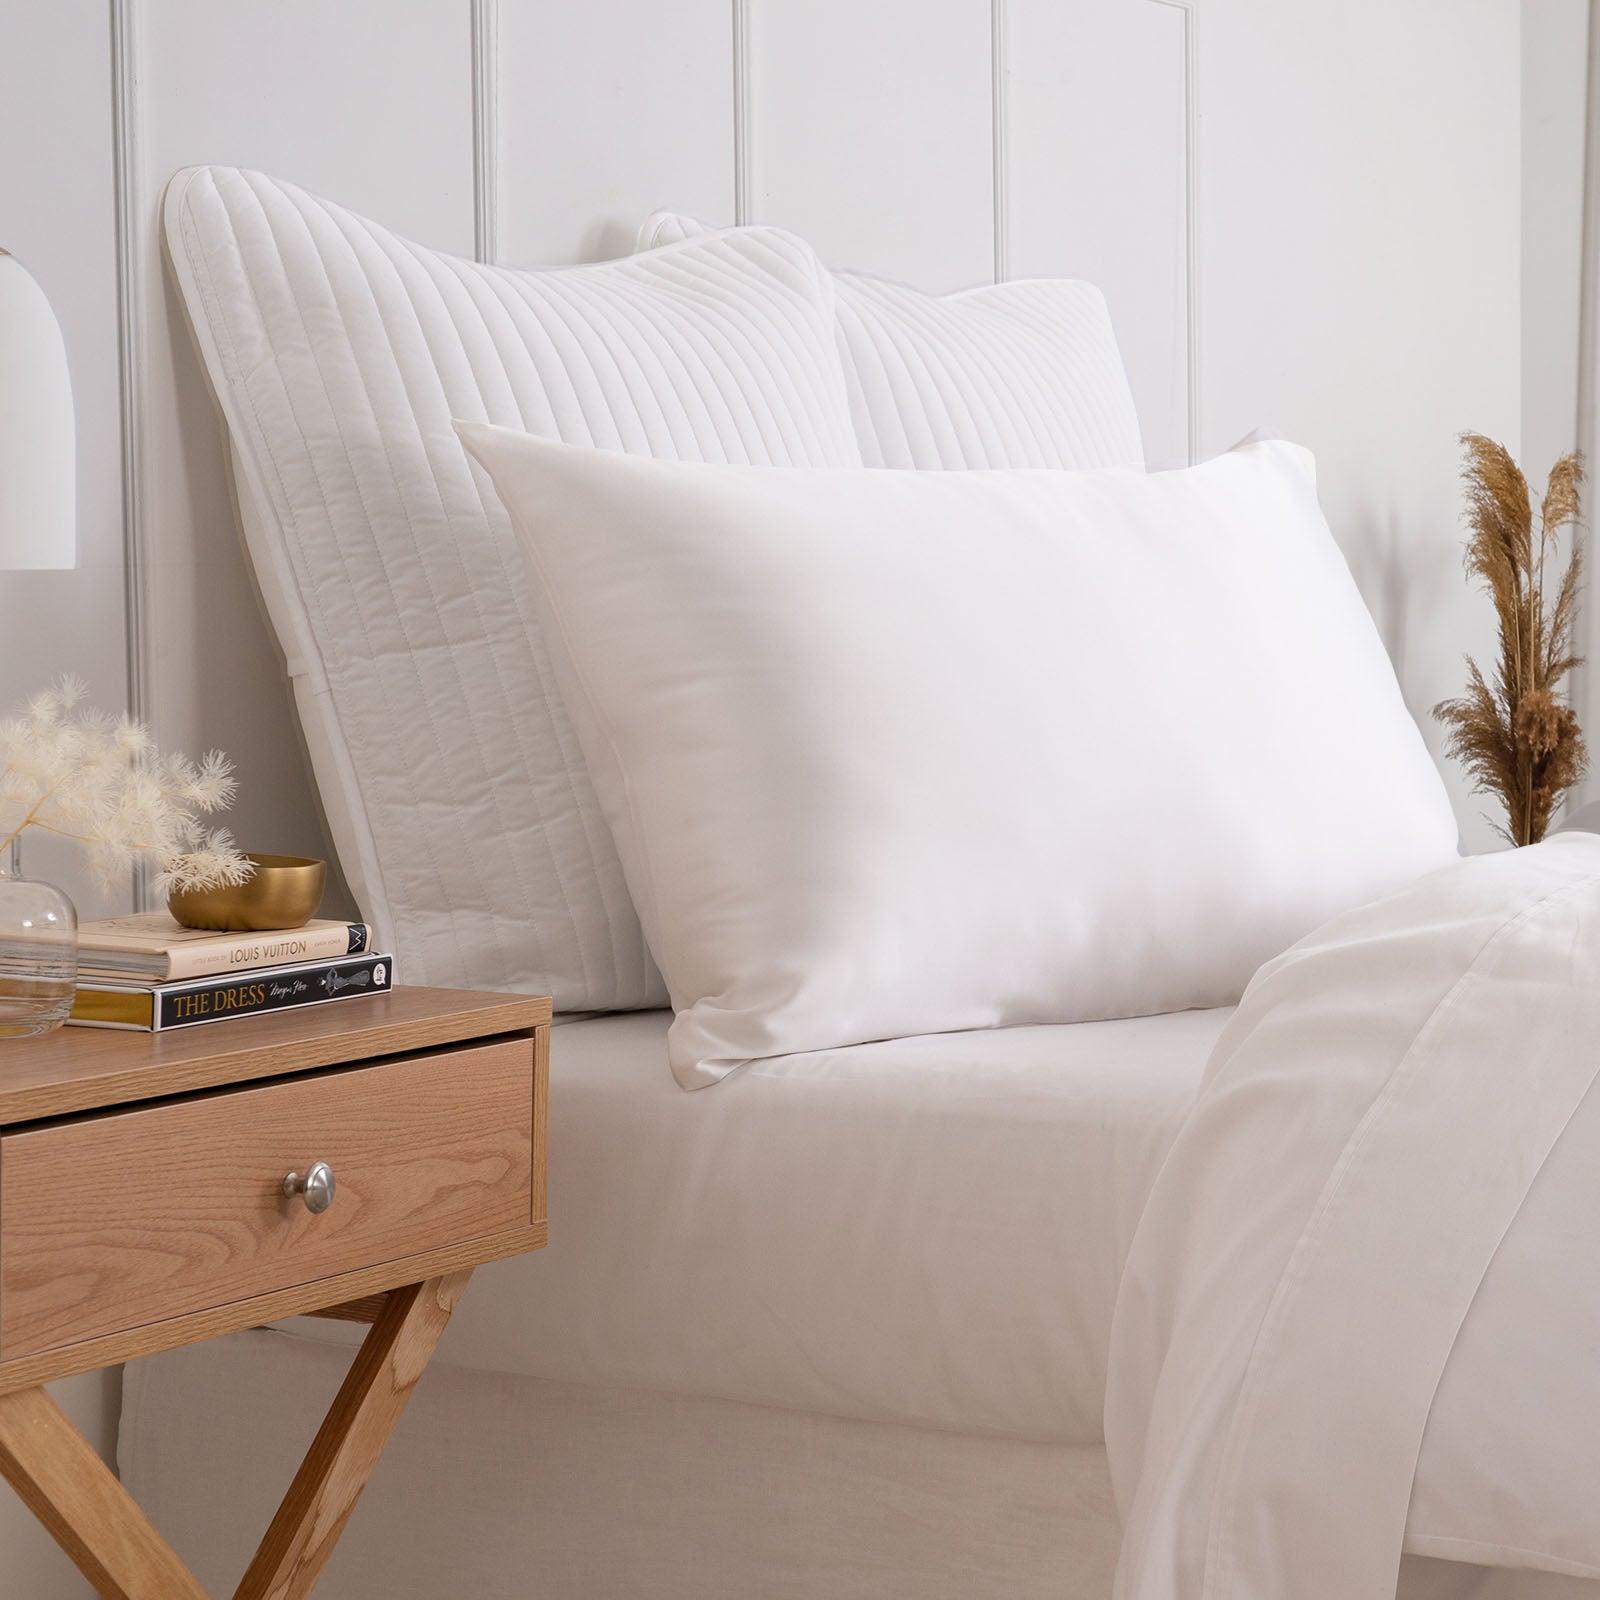 Royal Comfort Pure Silk Pillow Case 100% Mulberry Silk Hypoallergenic Pillowcase